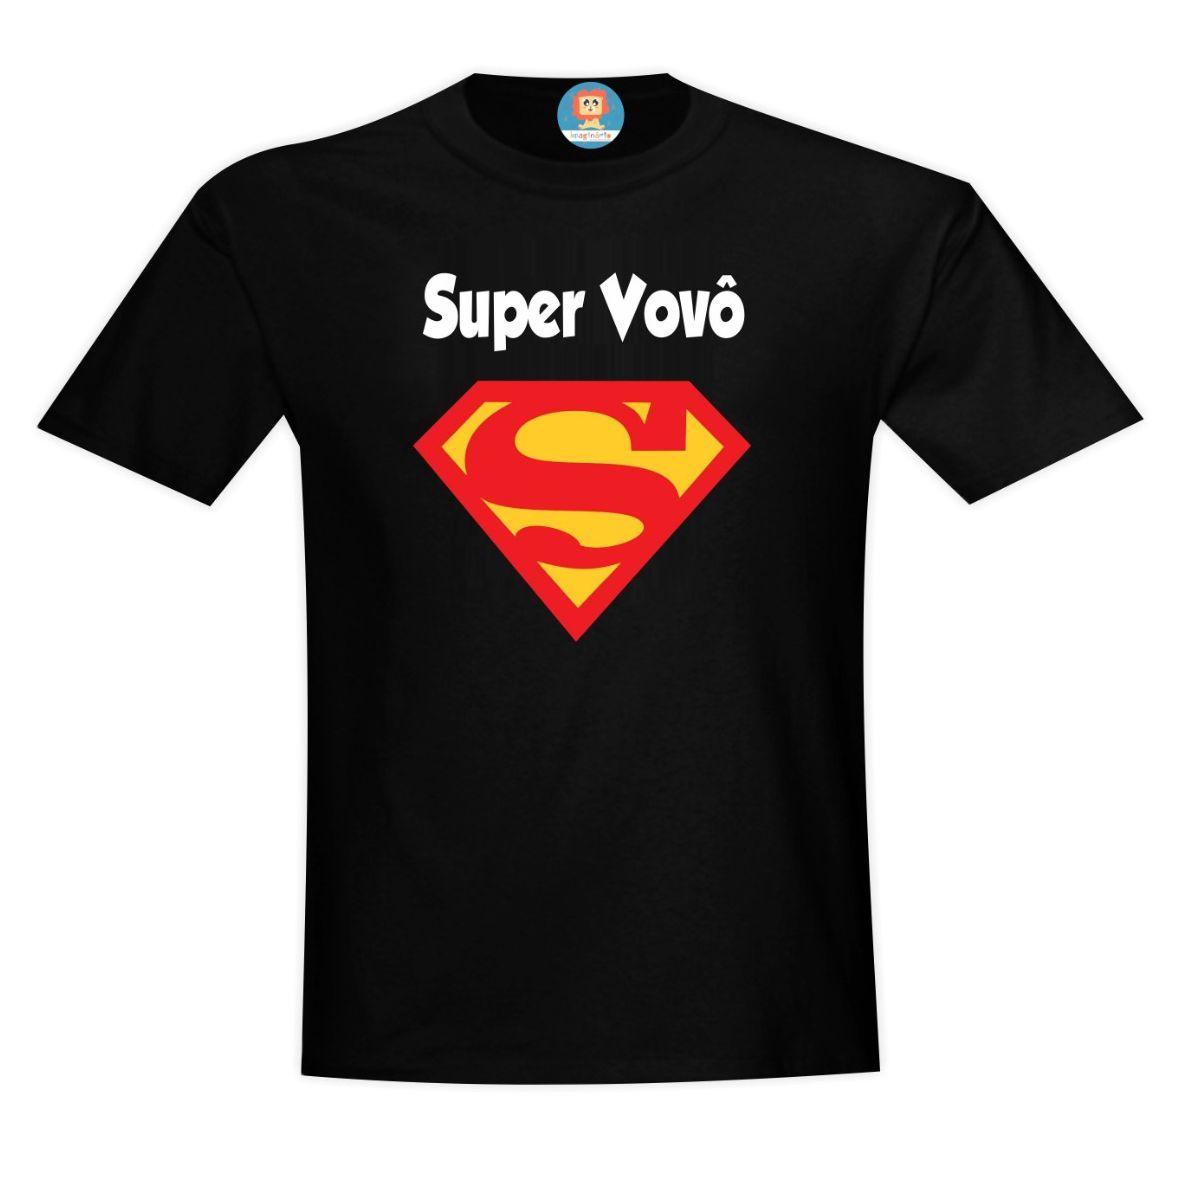 Camiseta Adulto Preta Super Vovô